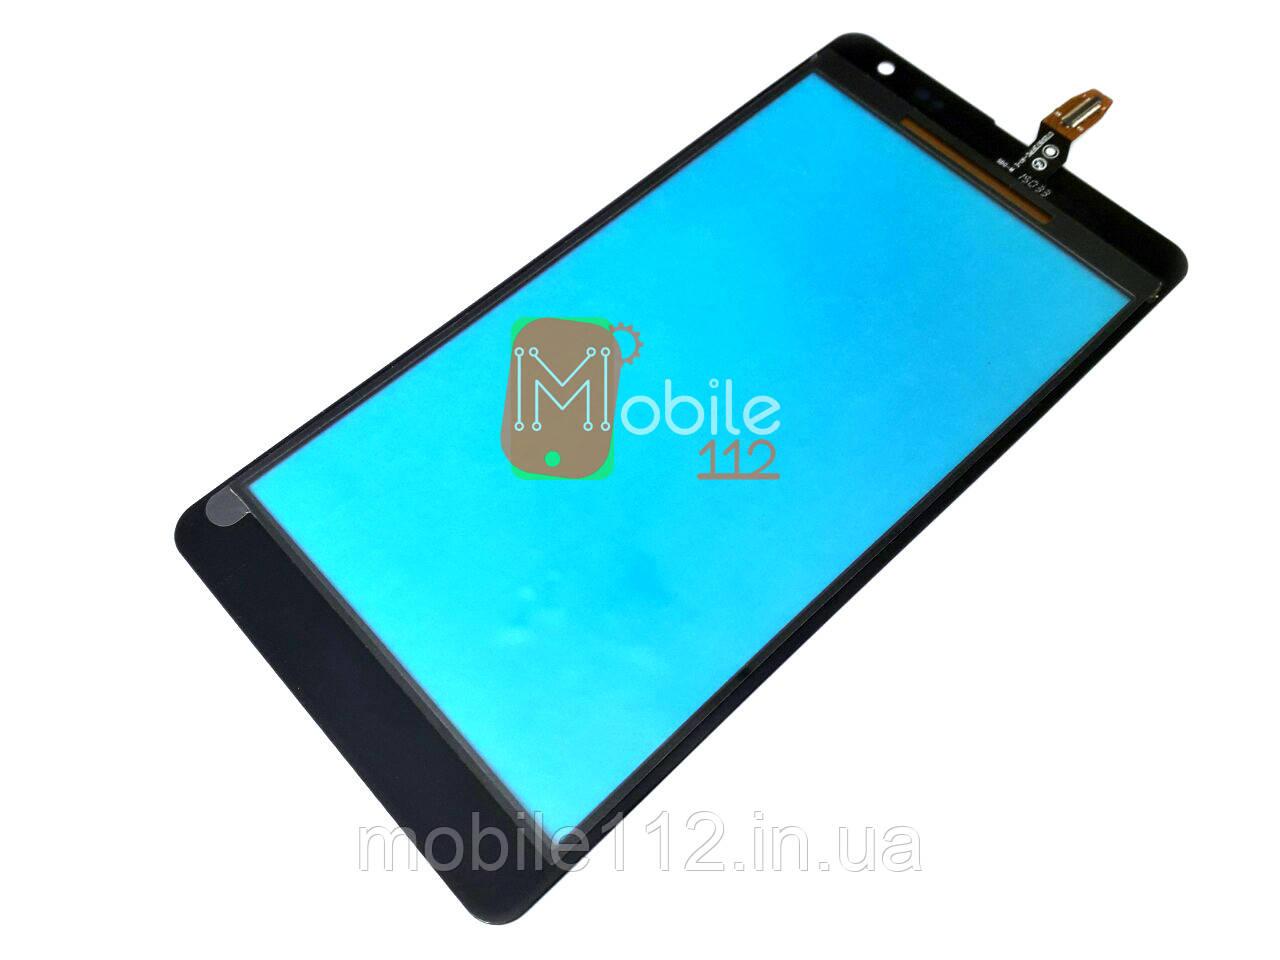 Тачскрин для Microsoft 535 Lumia Dual Sim RM-1090 (CT2S1973FPC-A1-E), чёрный